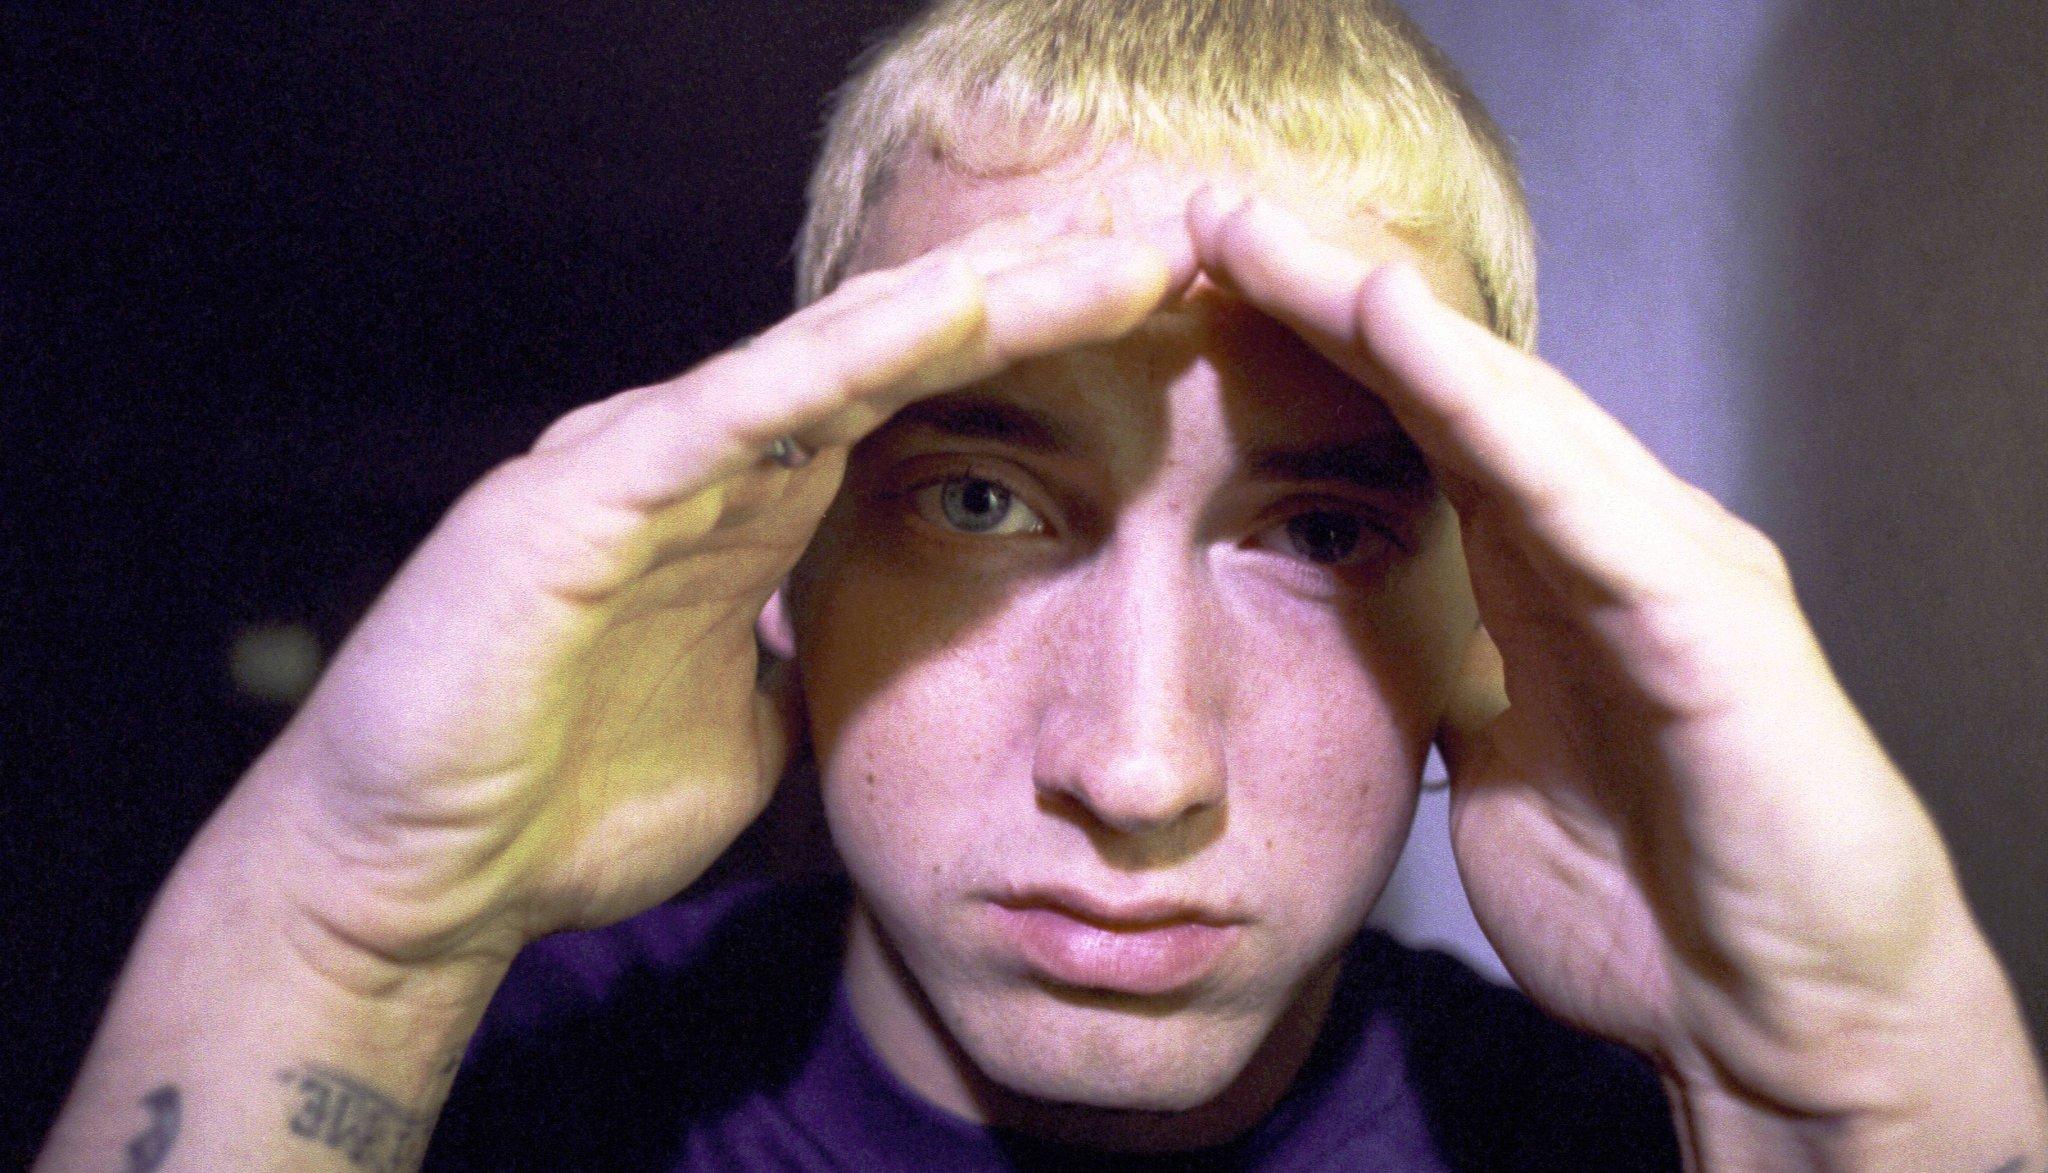 Eminem's 'Slim Shady' EP turns 20 today. Check out the rapper's best songs https://t.co/NfcFnGKki4 https://t.co/8pqmDMNtNT